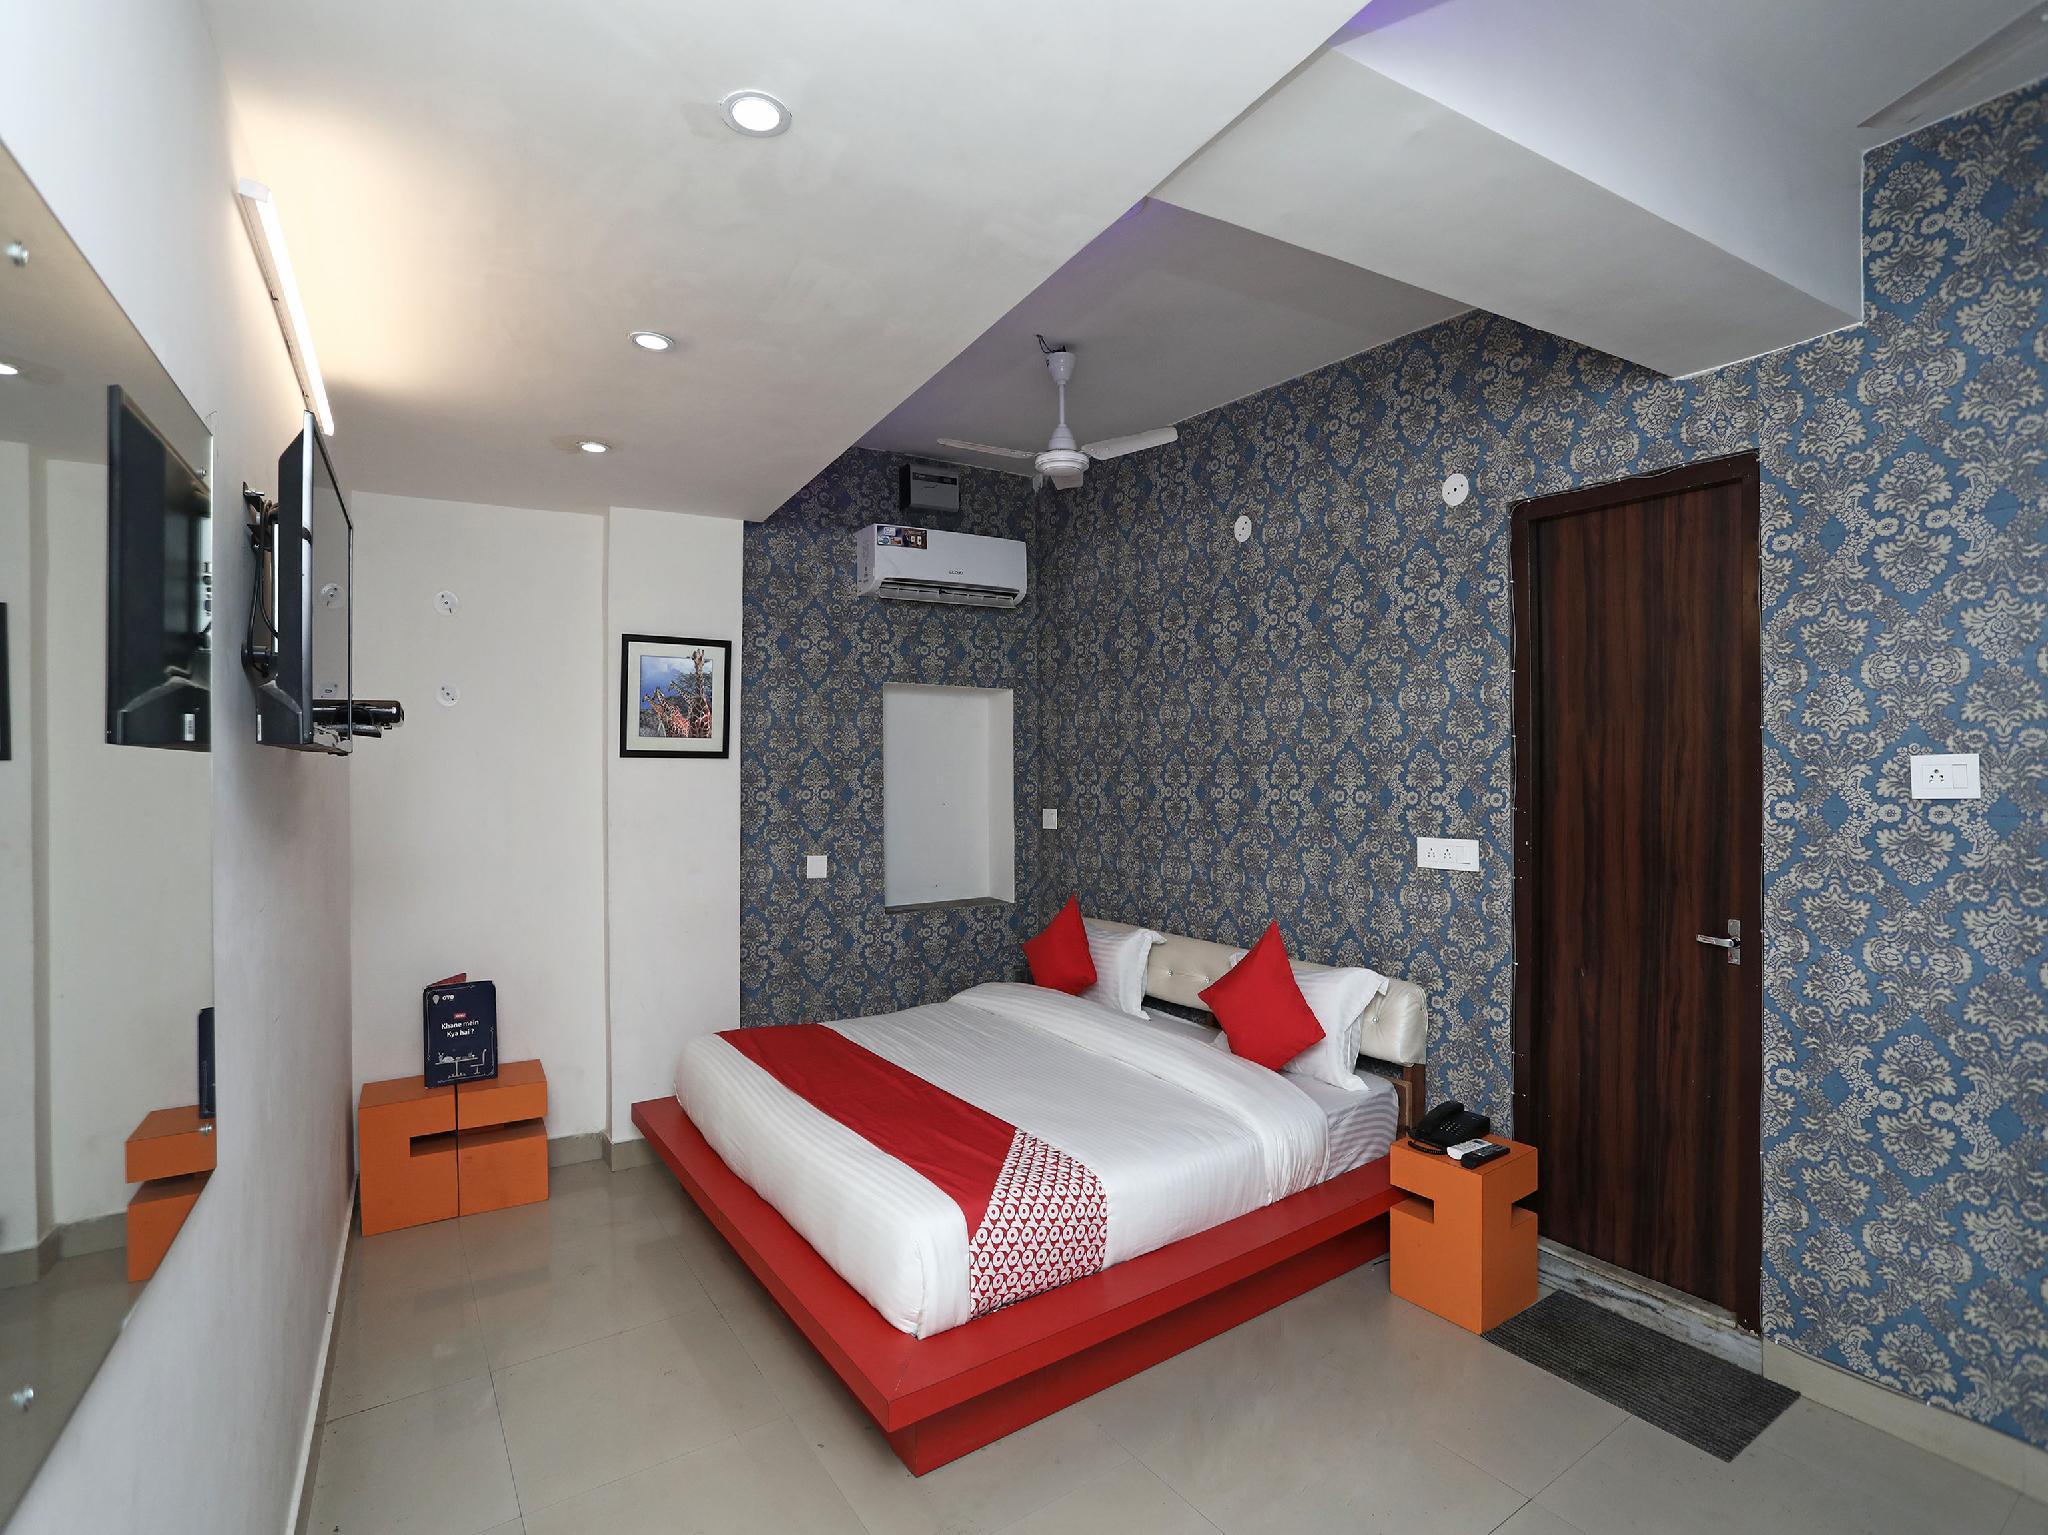 OYO 17085 Bhagat Residency